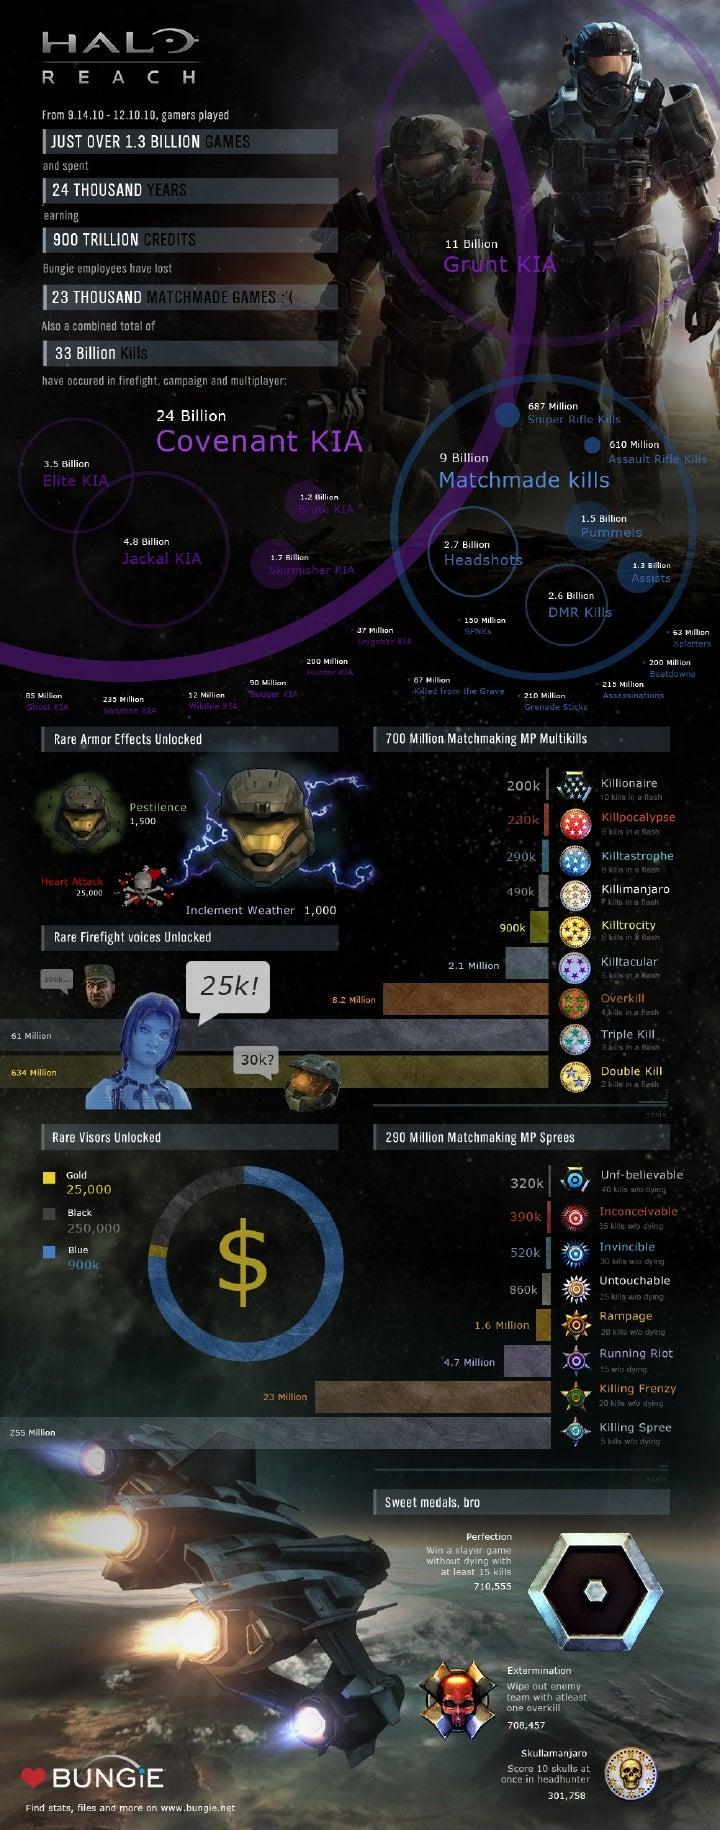 Halo: Reach — Over 33 Billion Served